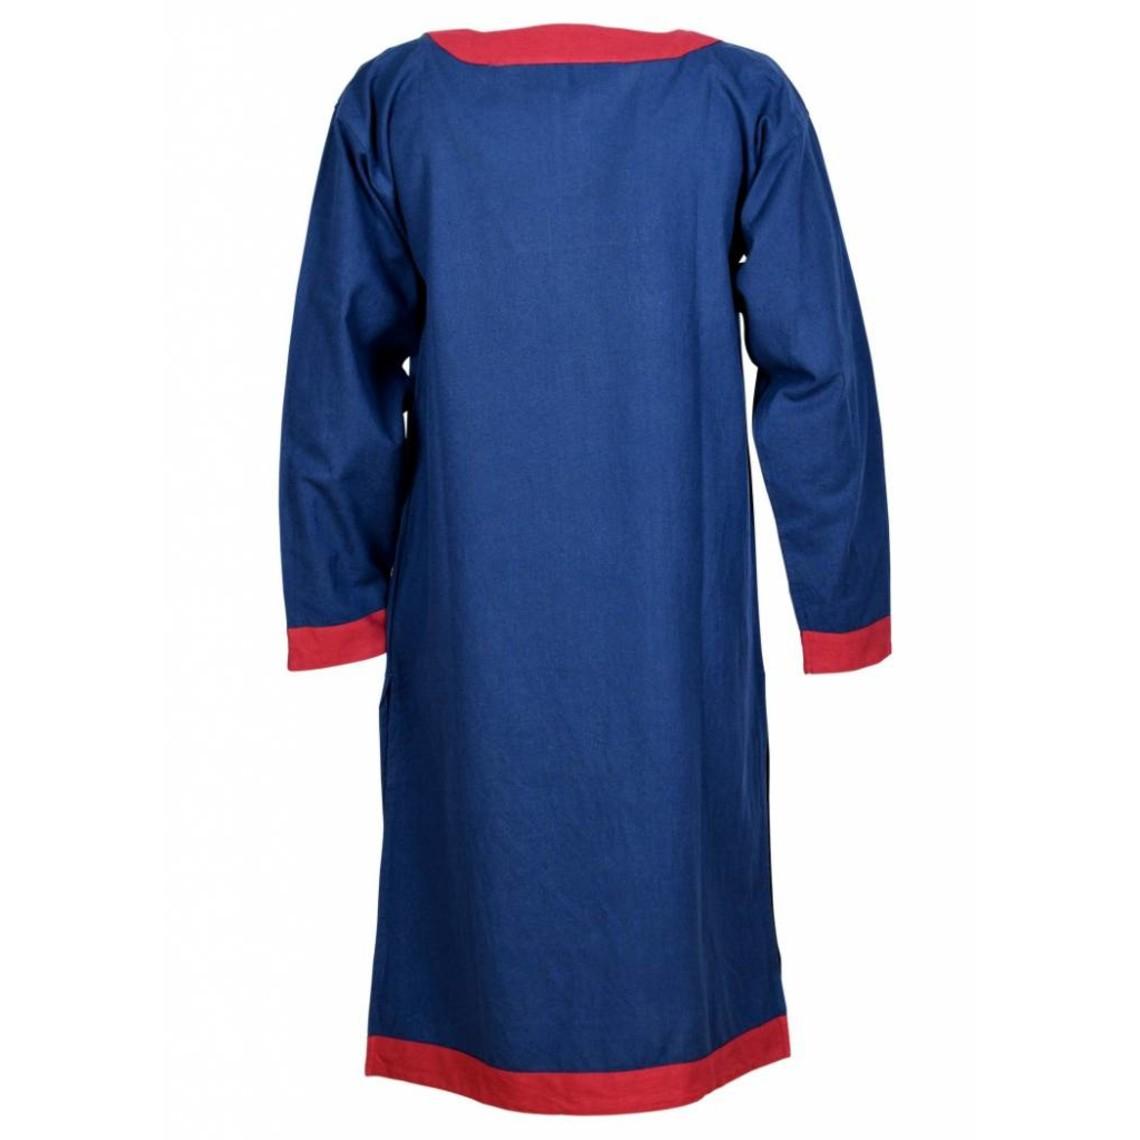 (Early) mittelalterliche Tunika Clovis, blau-rot